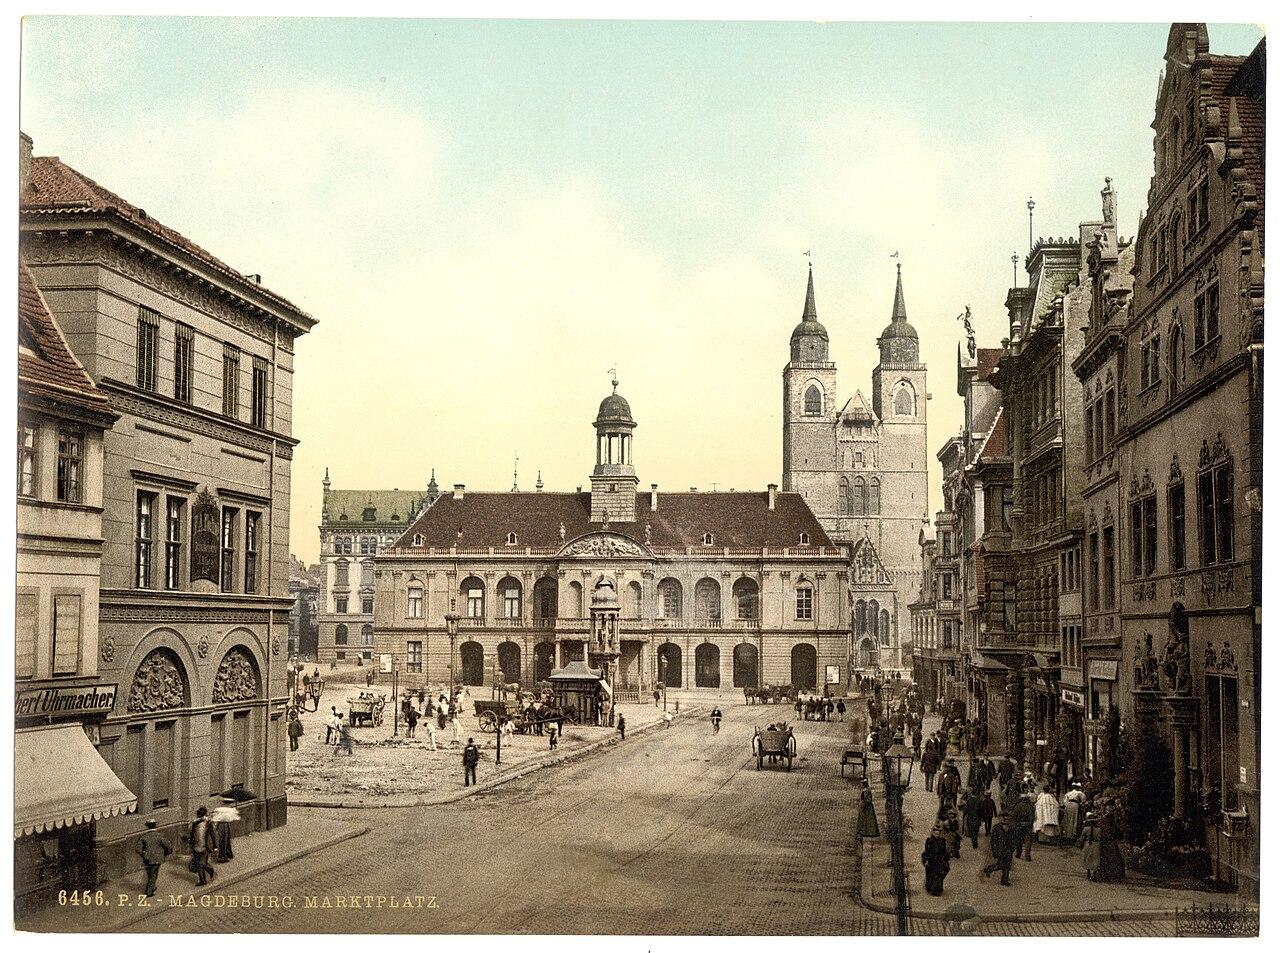 Market place, Magdeburg, Germany Saxony-Anhalt, Germany-LCCN2002720636.jpg